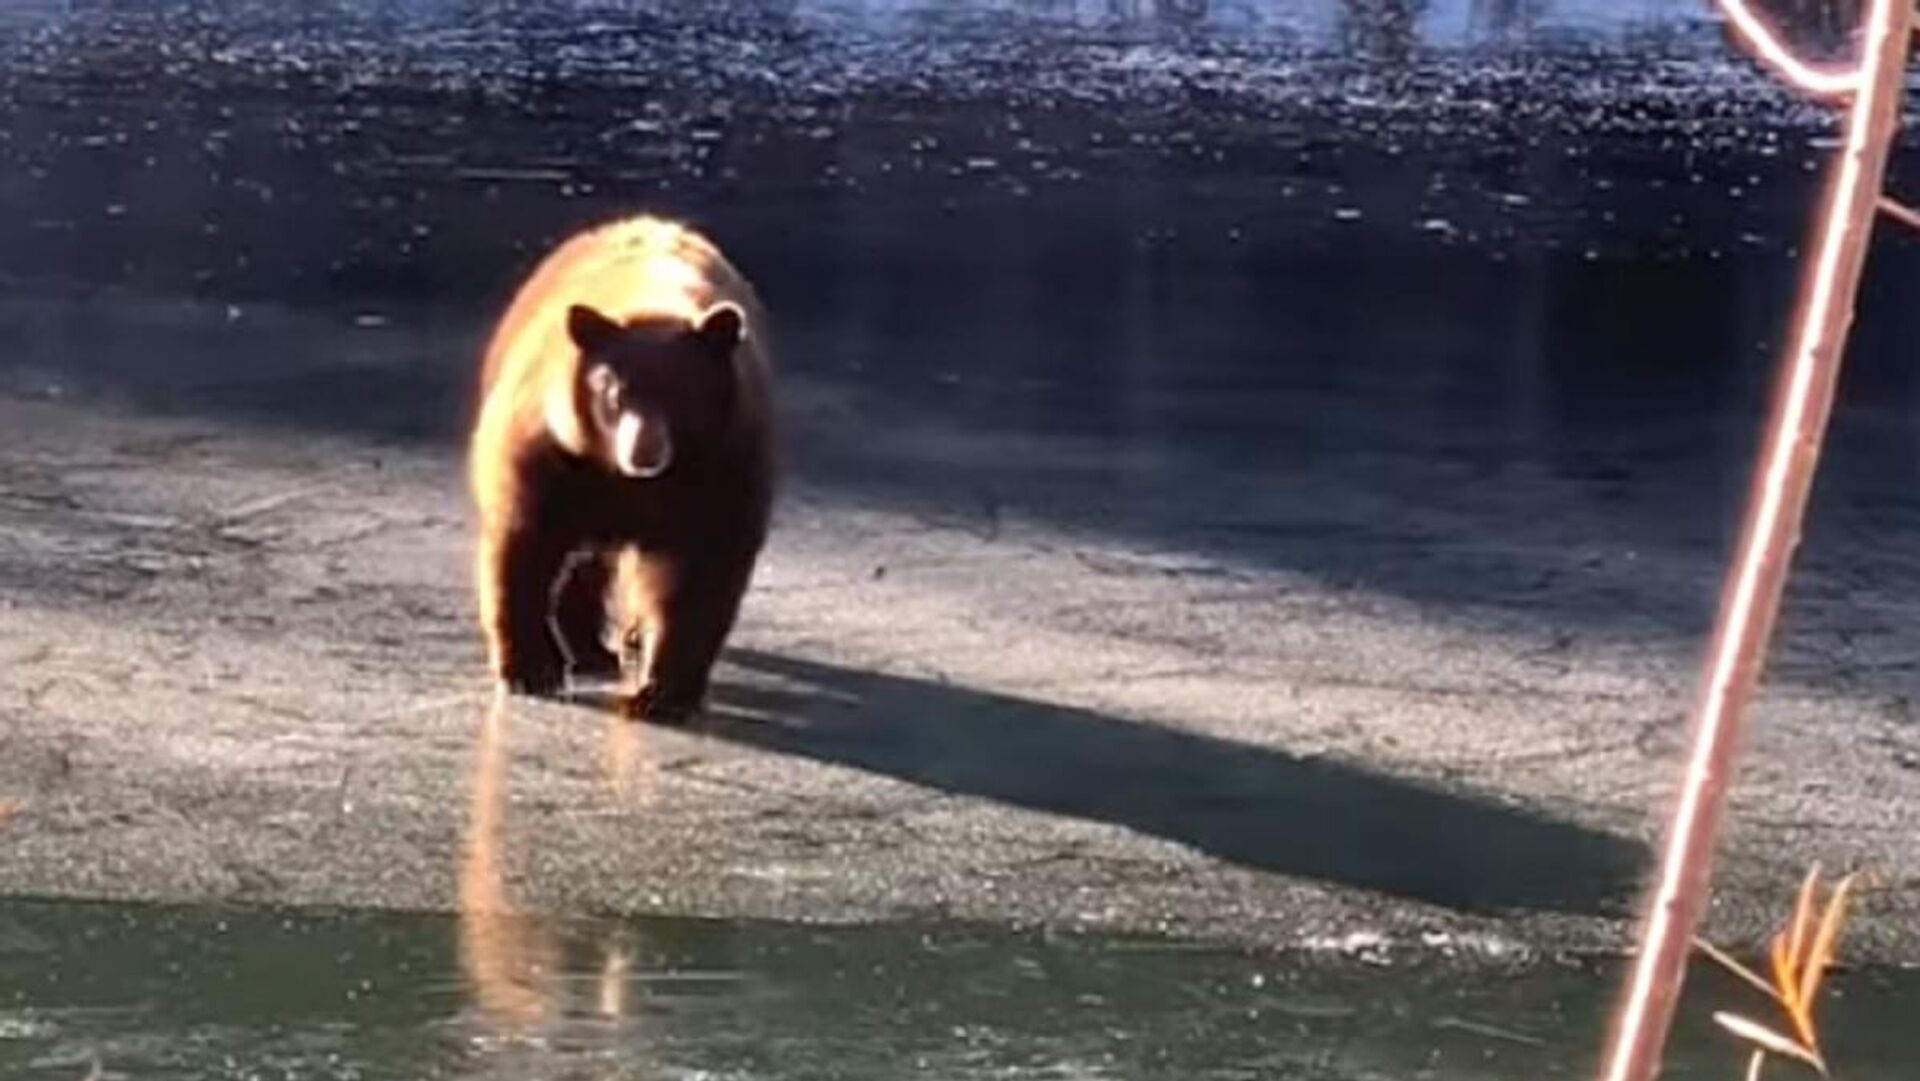 Un oso vive intensos momentos sobre el fino hielo - Sputnik Mundo, 1920, 17.02.2021